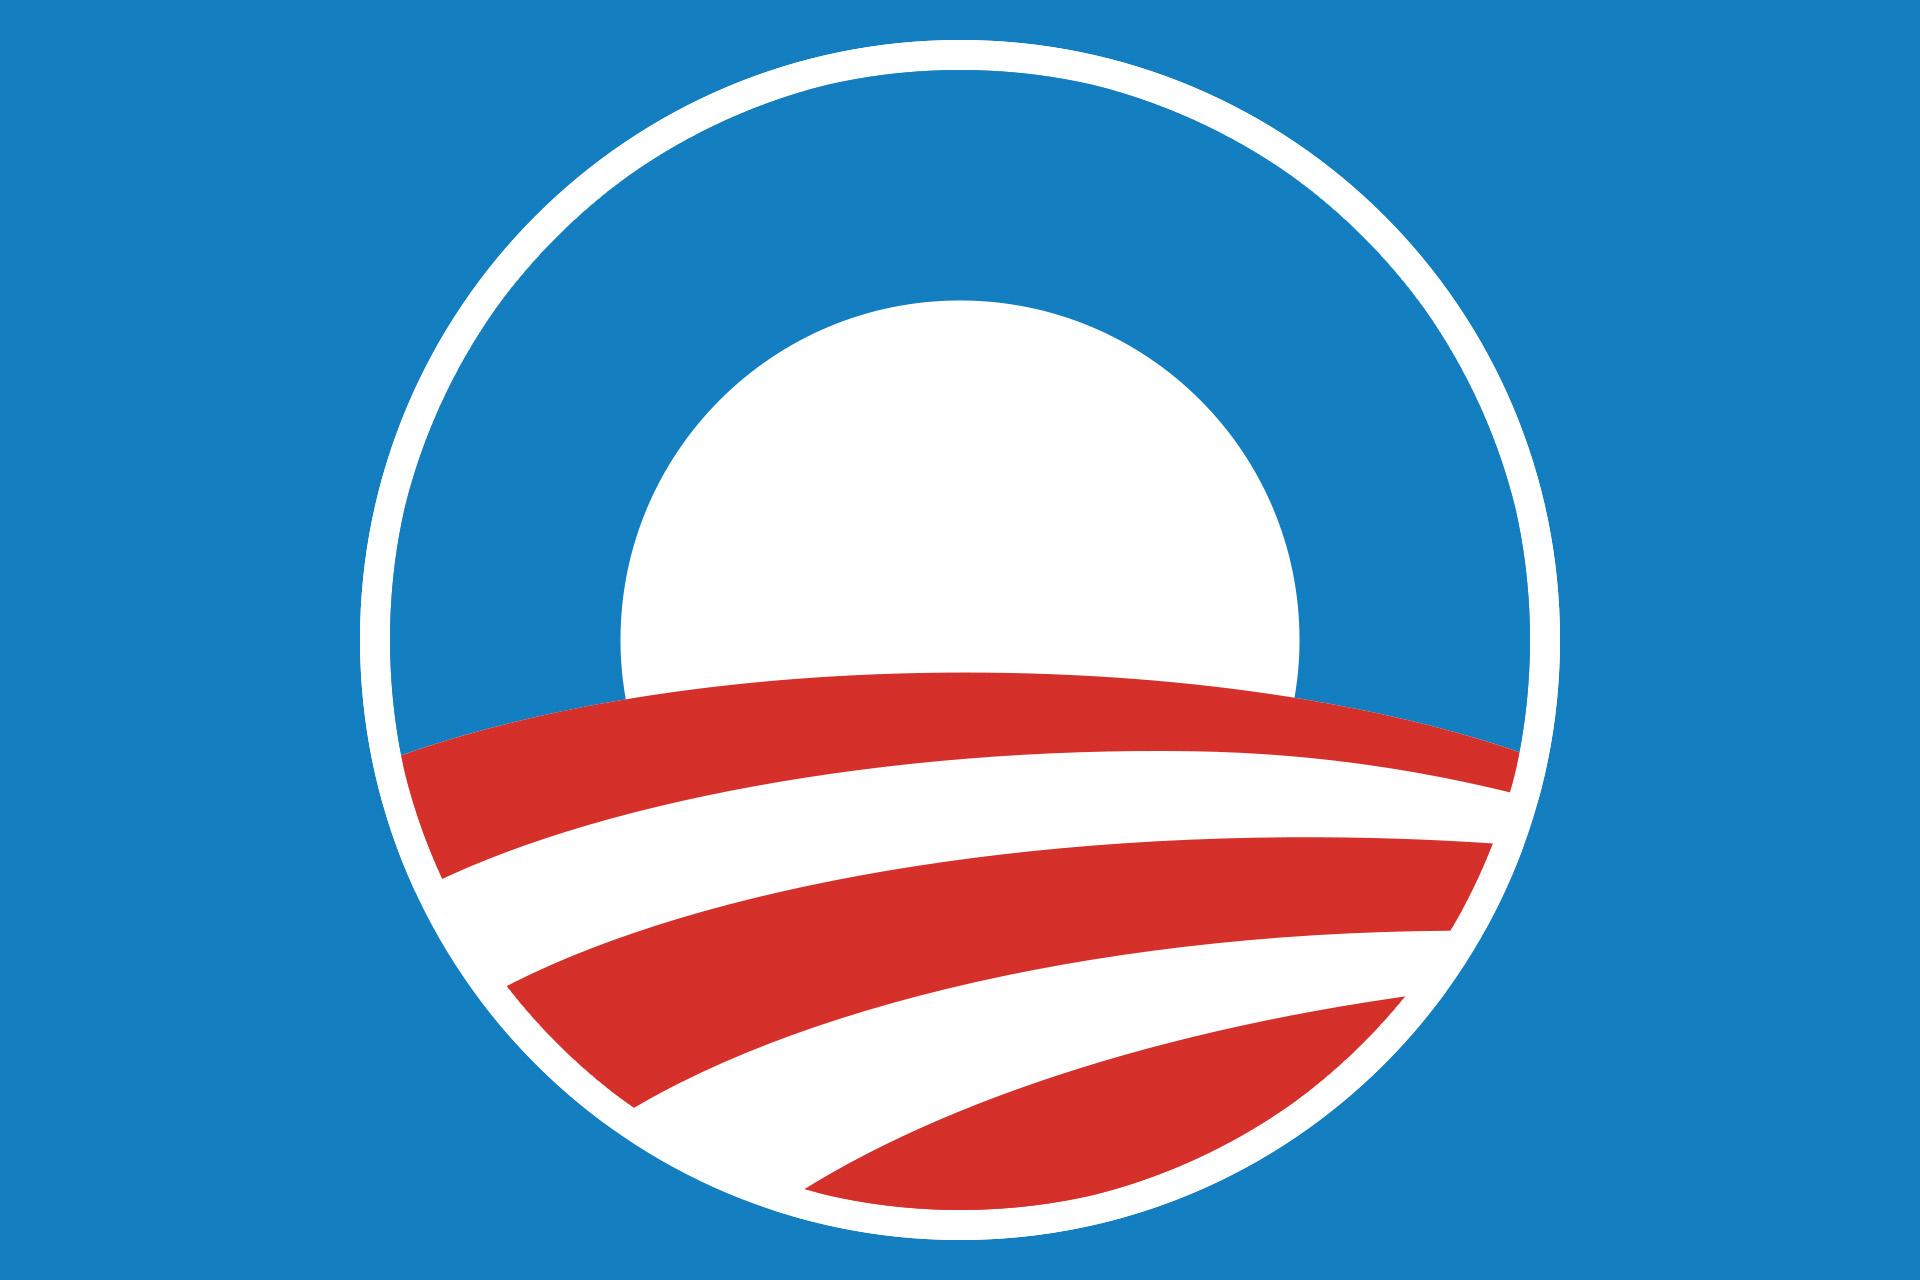 Meaning Obama logo and symbol.